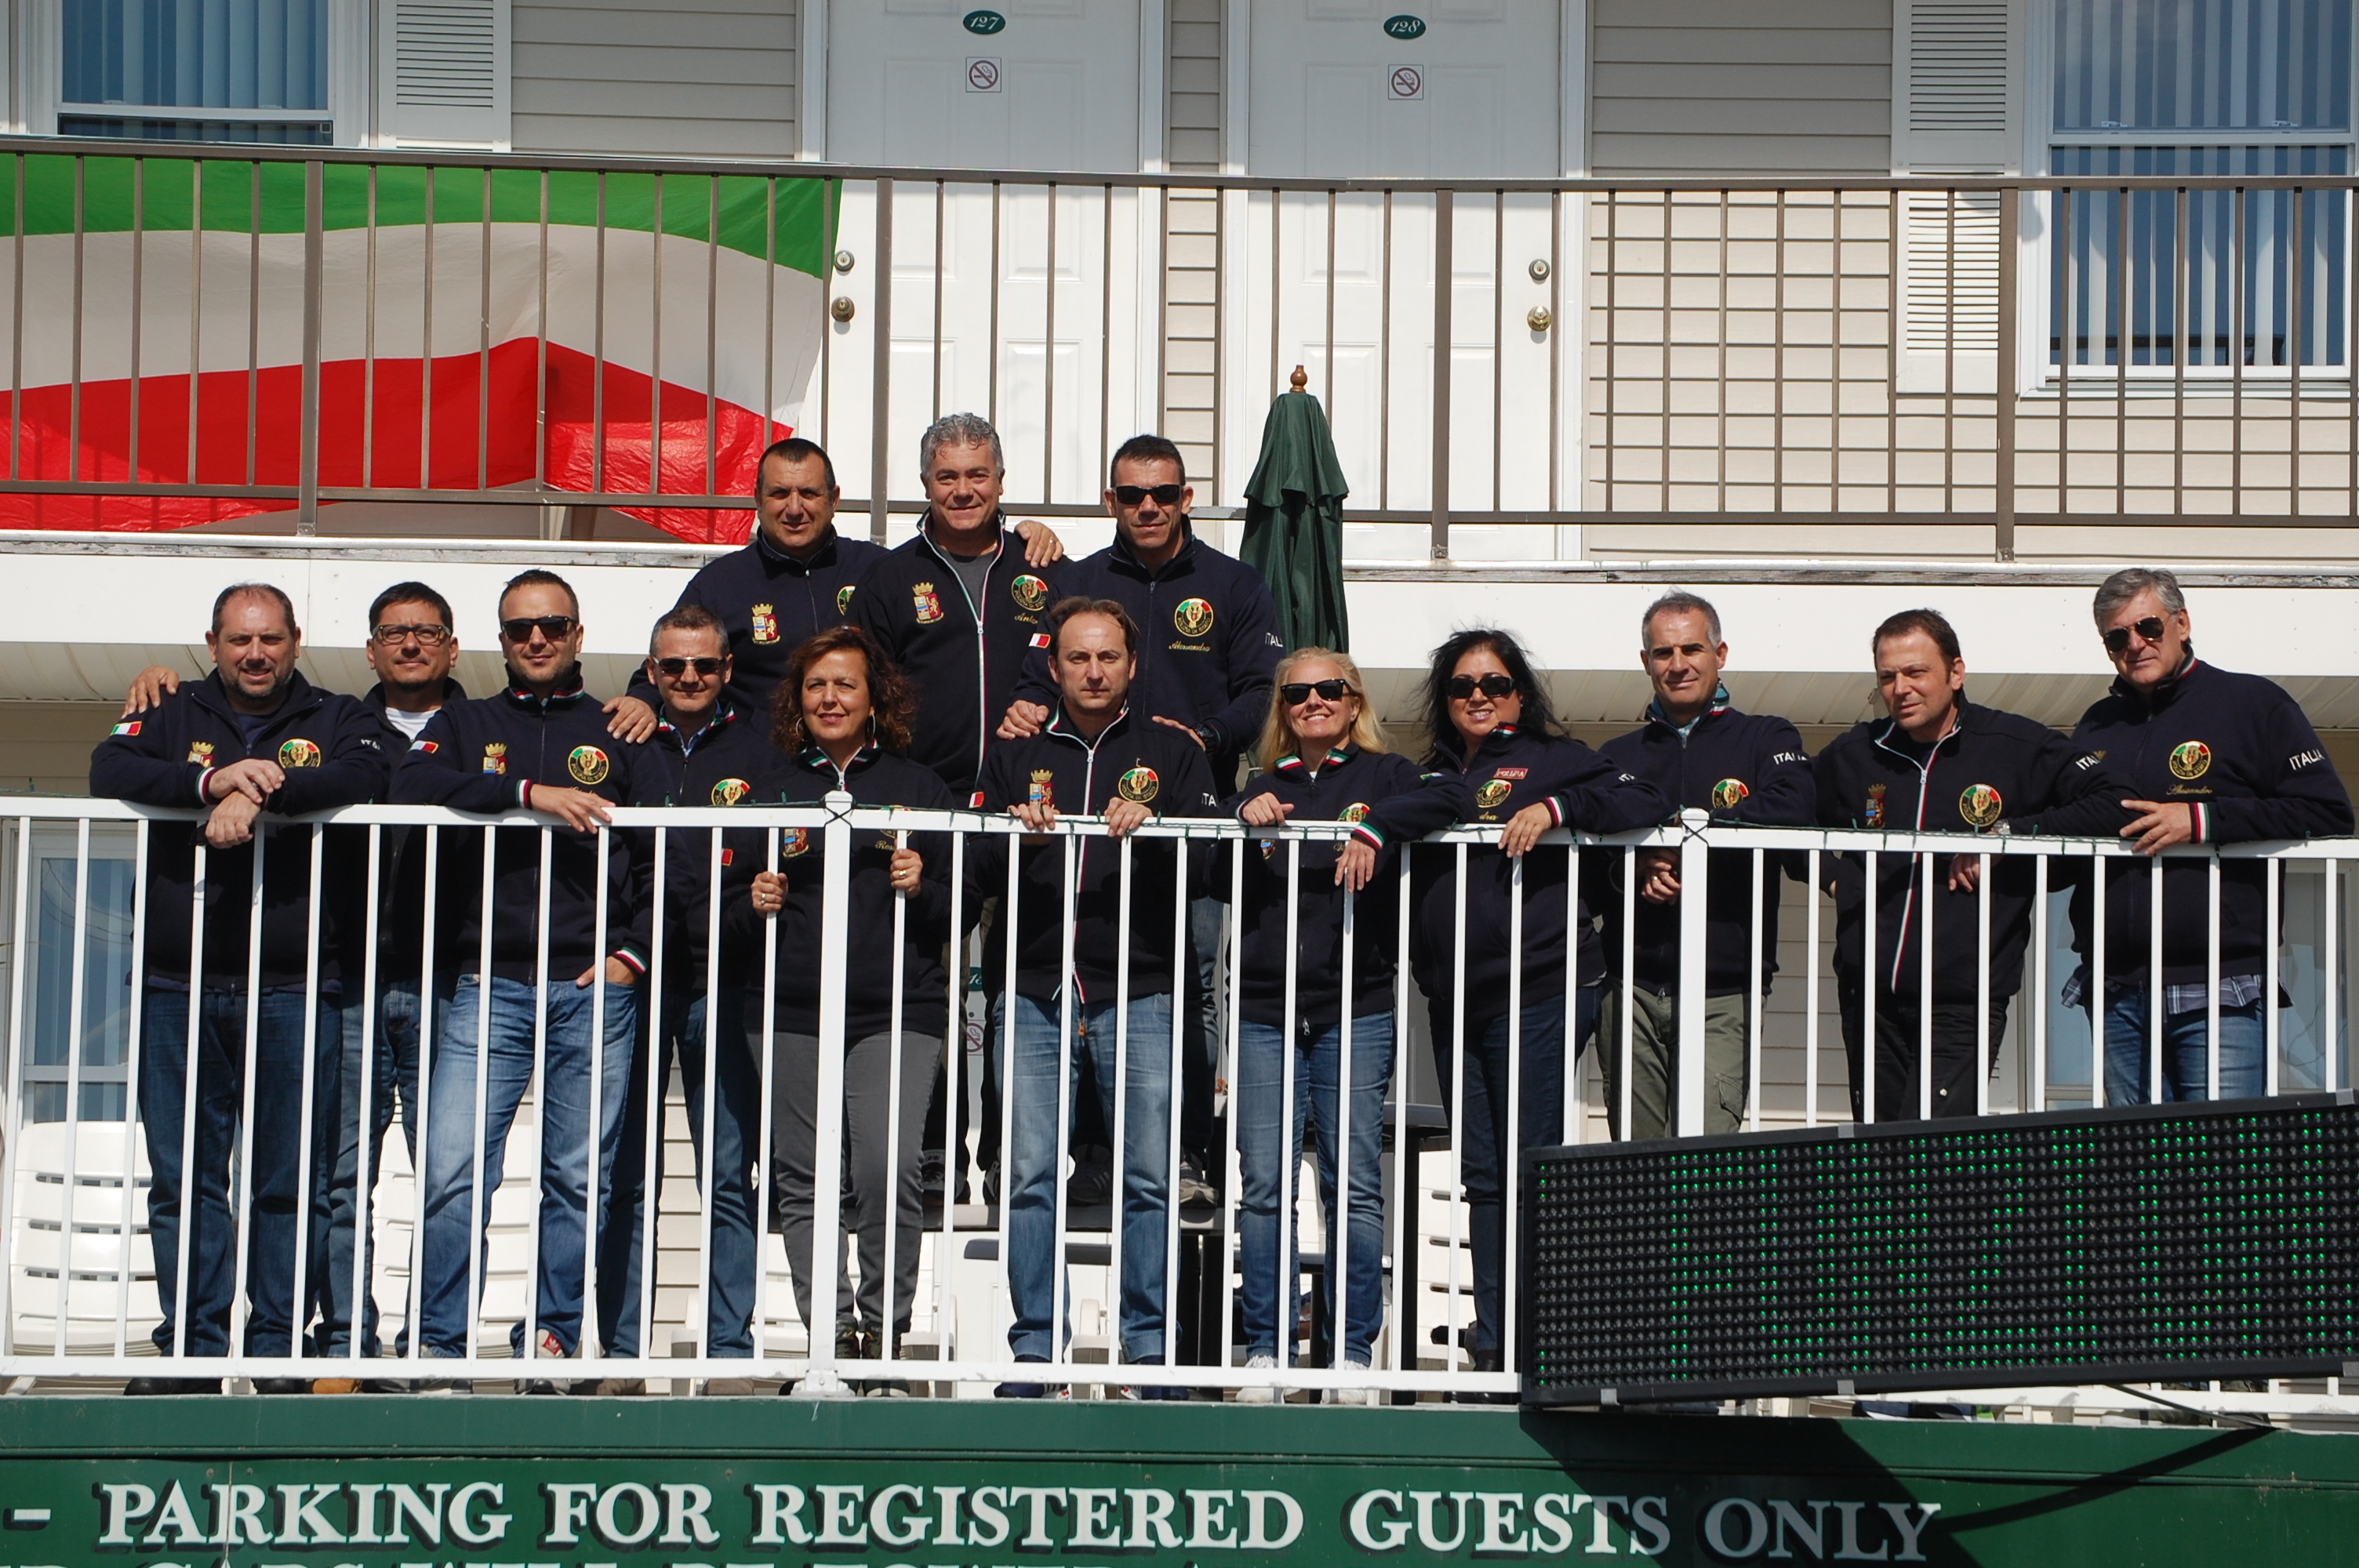 Members of the Polizia di Stato in Seaside Heights, Oct. 15, 2015. (Photo: Daniel Nee)